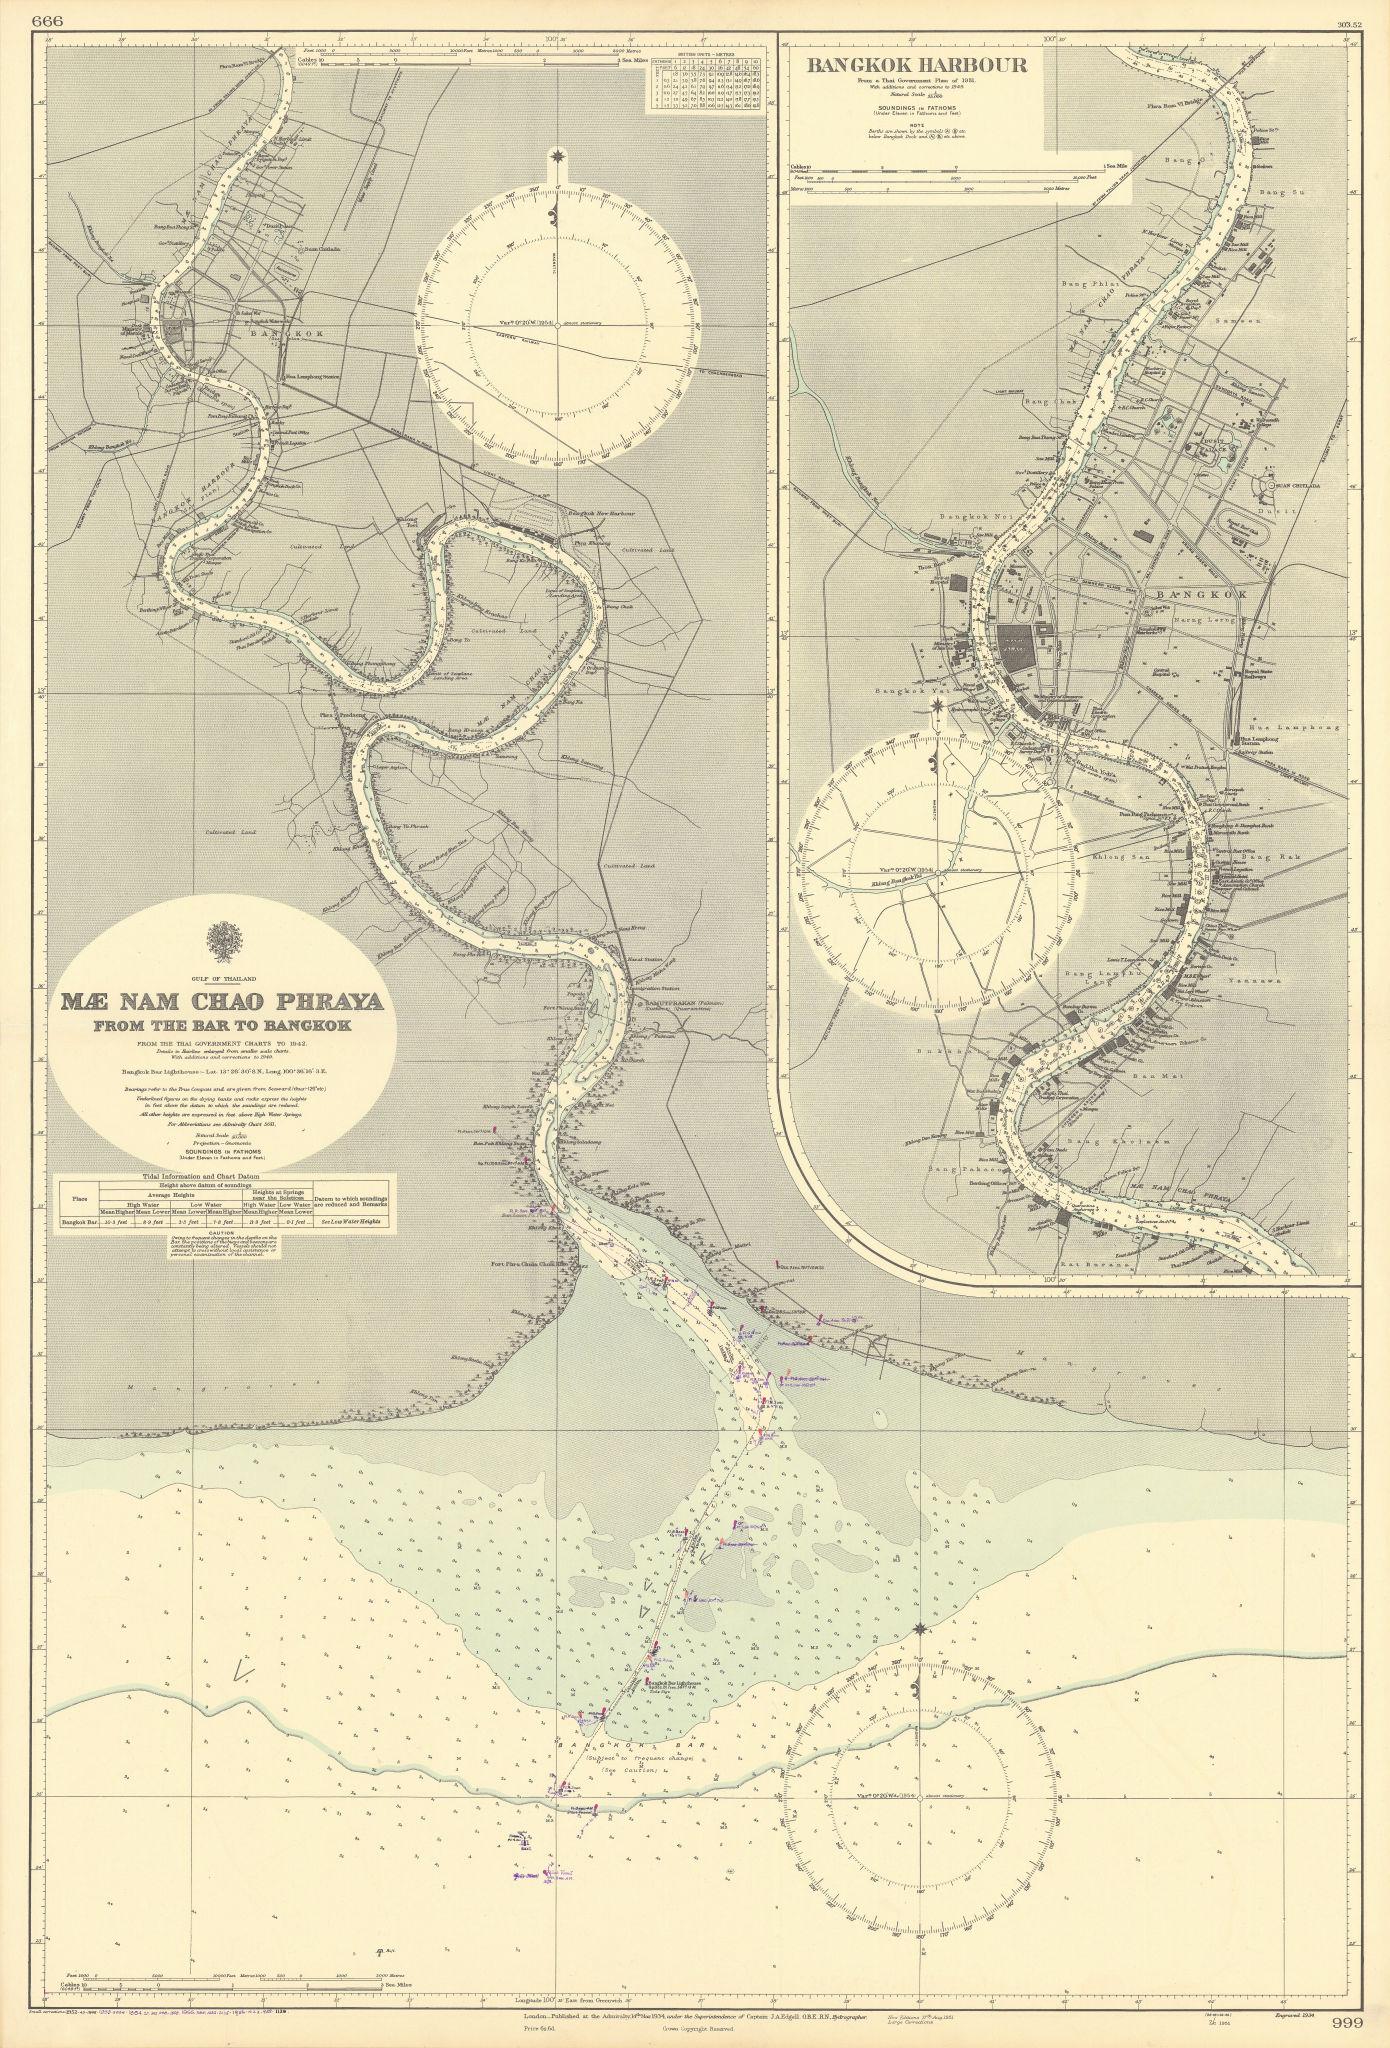 Bangkok Harbour Chao Phraya river Thailand. ADMIRALTY sea chart 1934 (1956) map